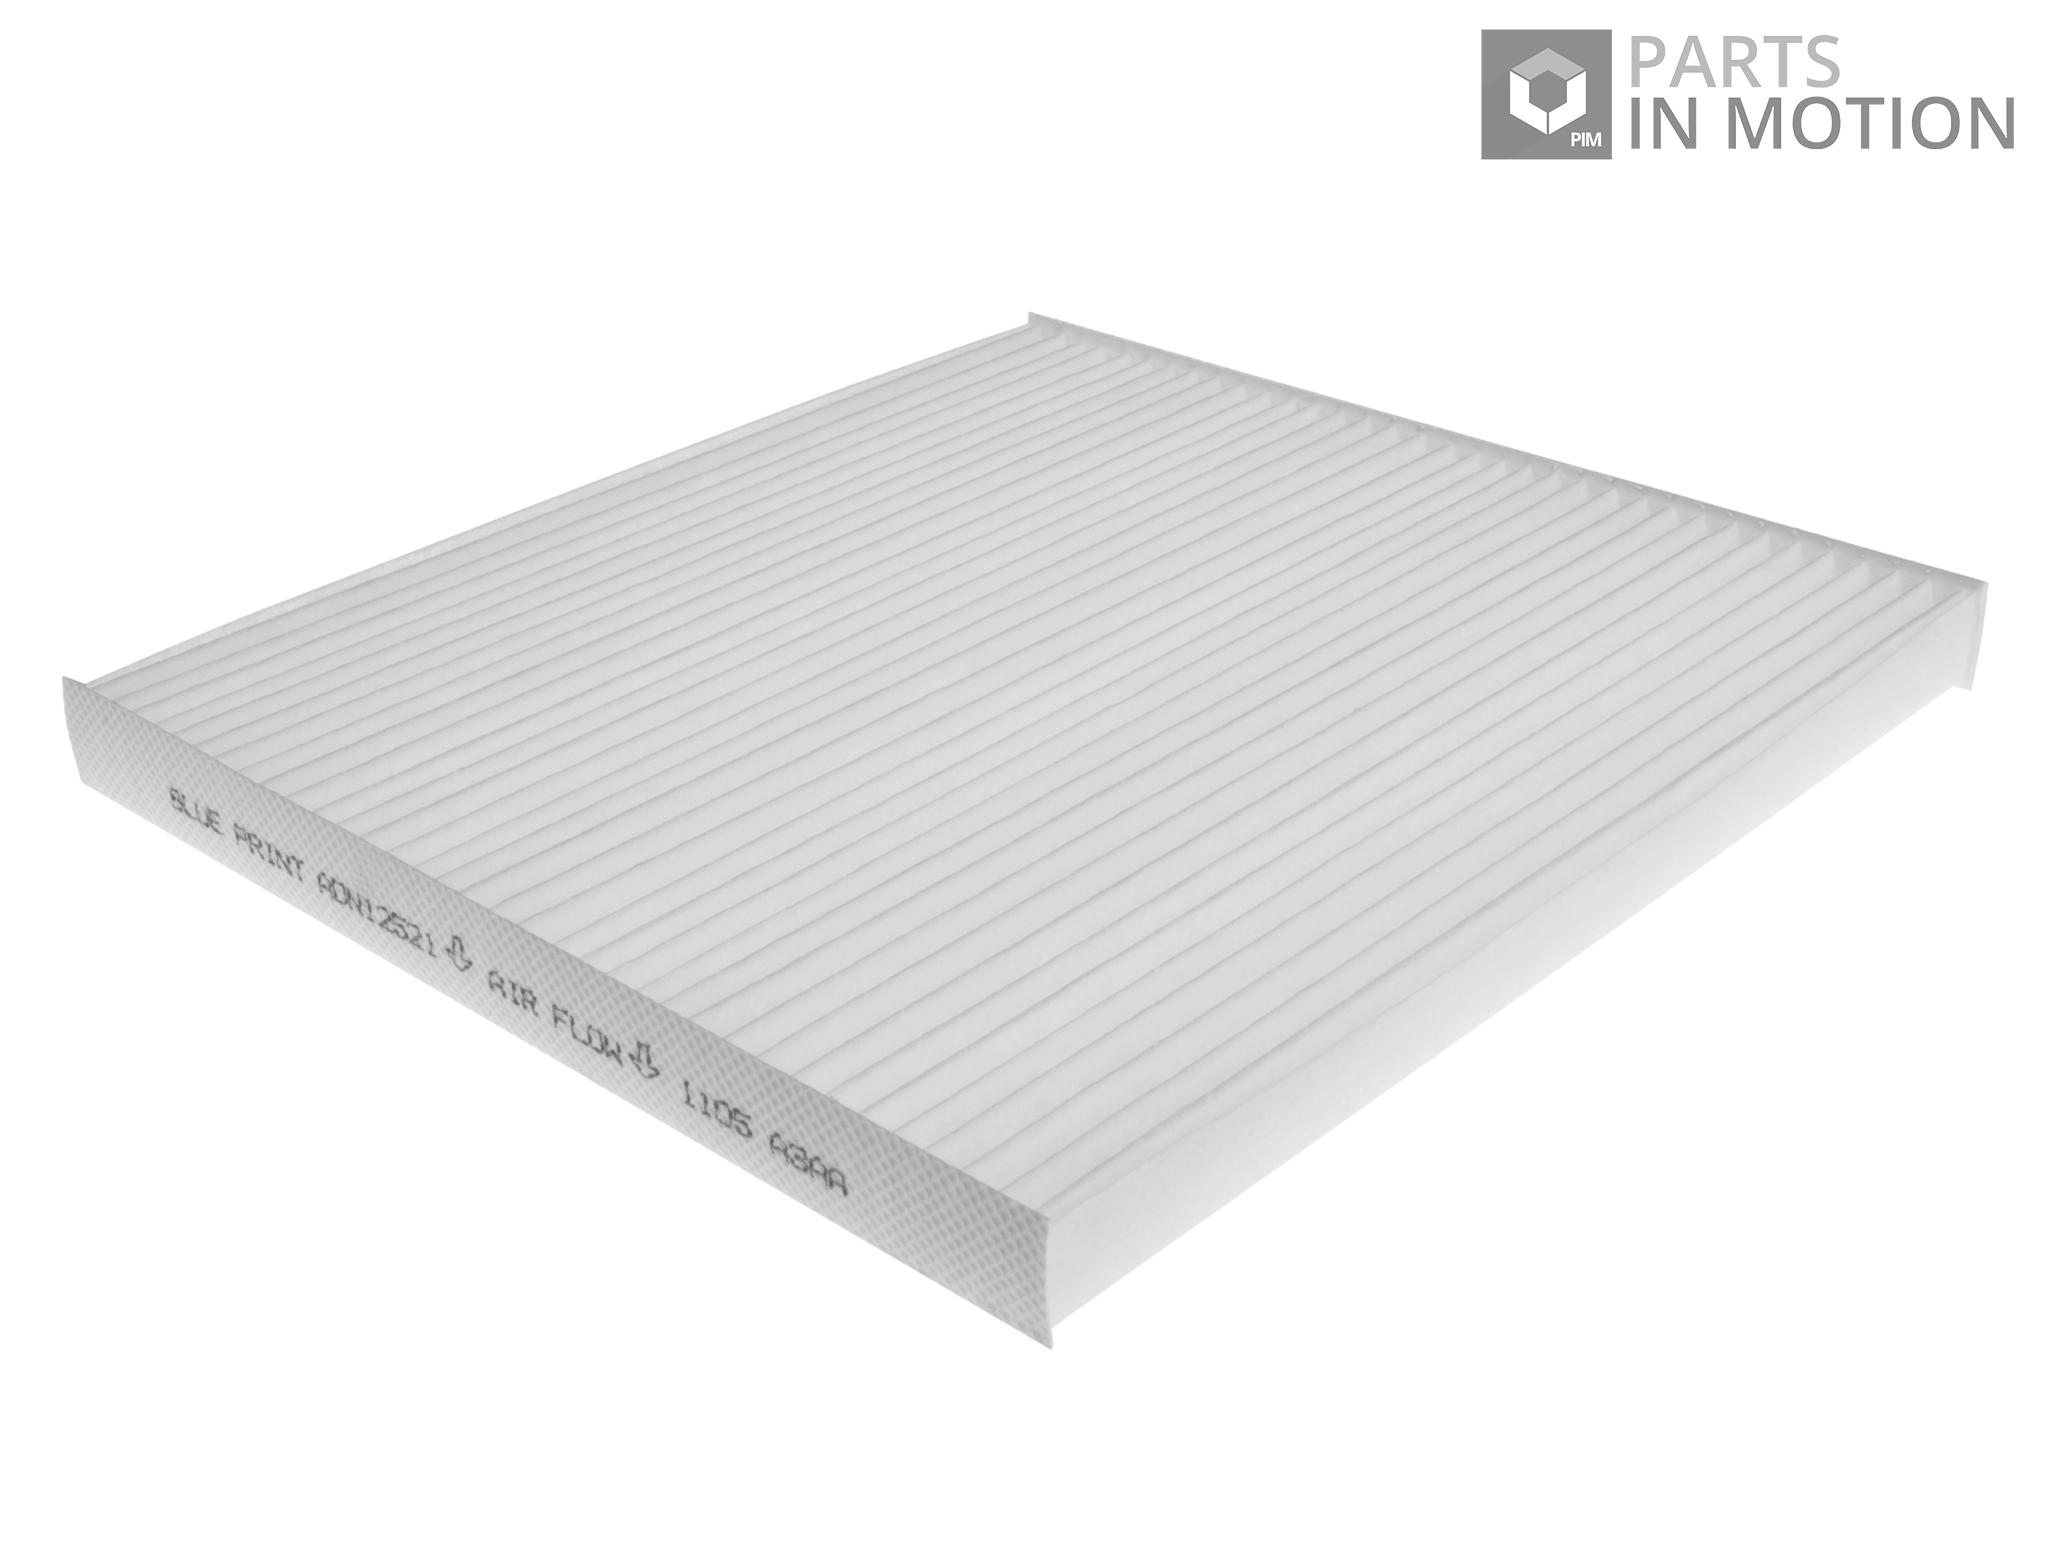 Cabin Filter fits NISSAN MICRA K13 1.2 2010 on ADL 272771HD0B Quality Pollen